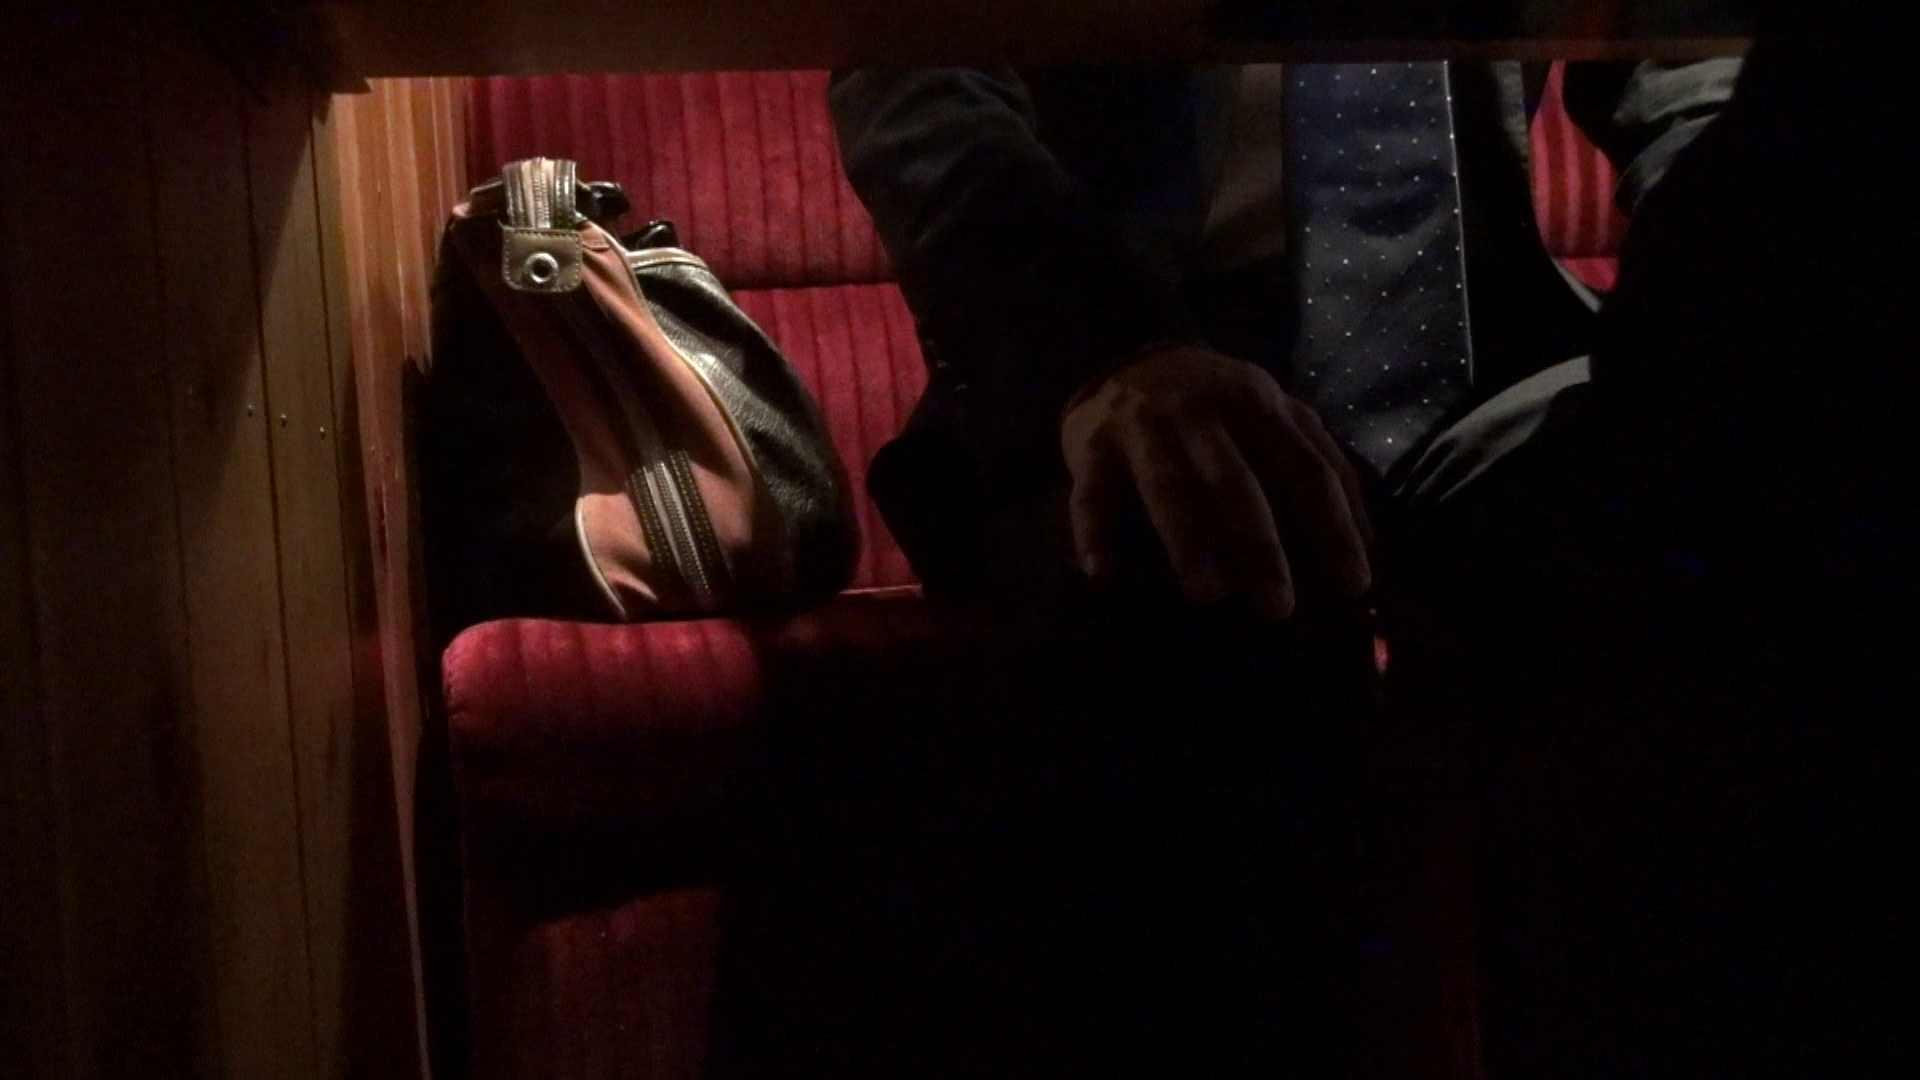 episode1 ヒロトさんと保険外交員との顔合わせ 盗撮エロすぎ   熟女  51連発 10